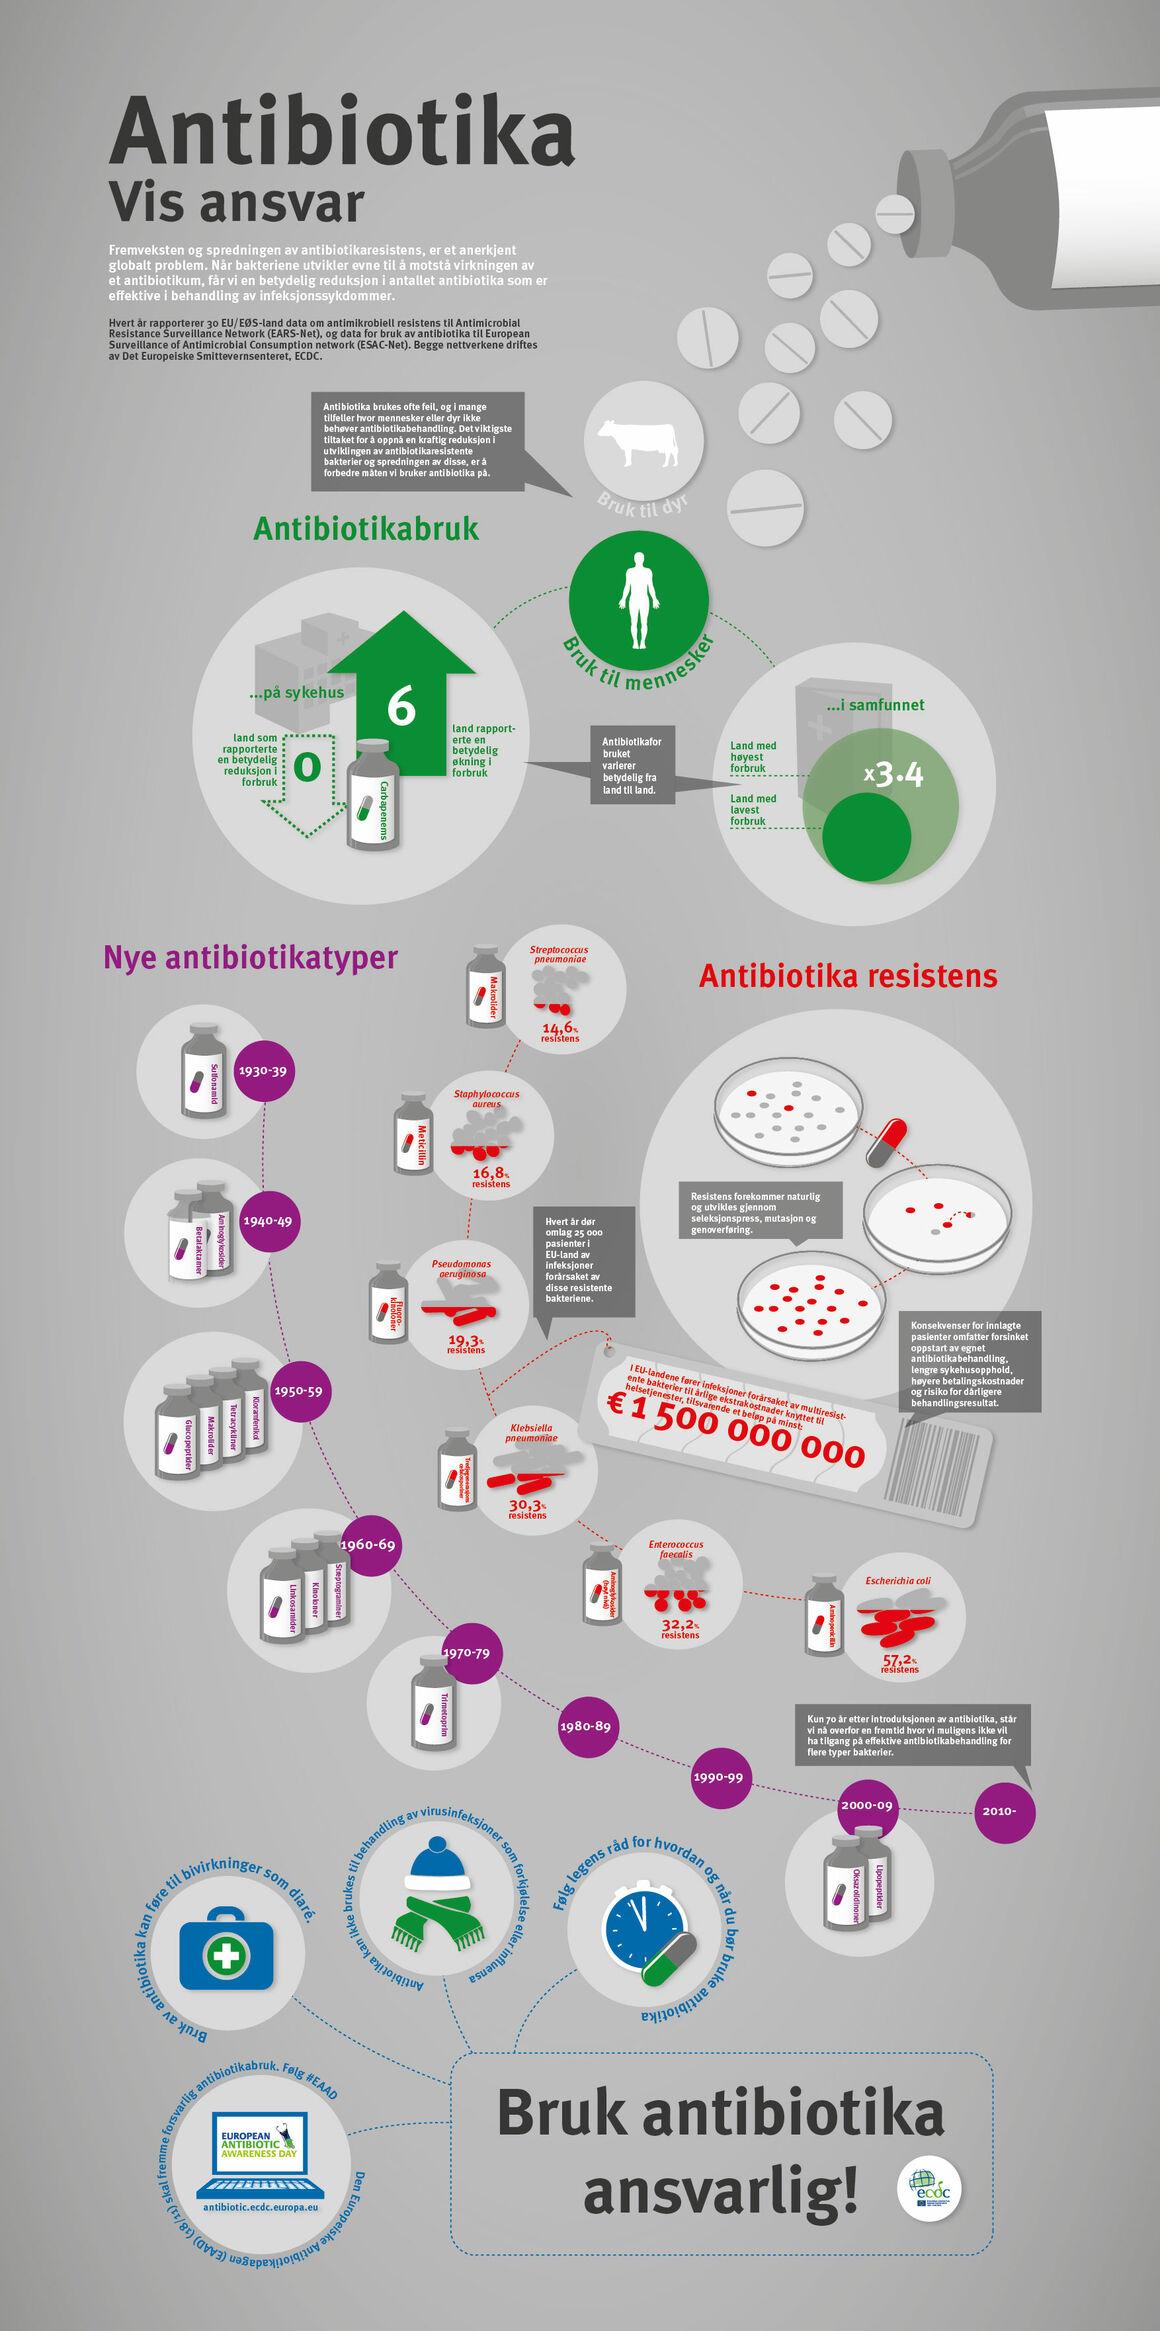 Antibiotika - Vis ansvar